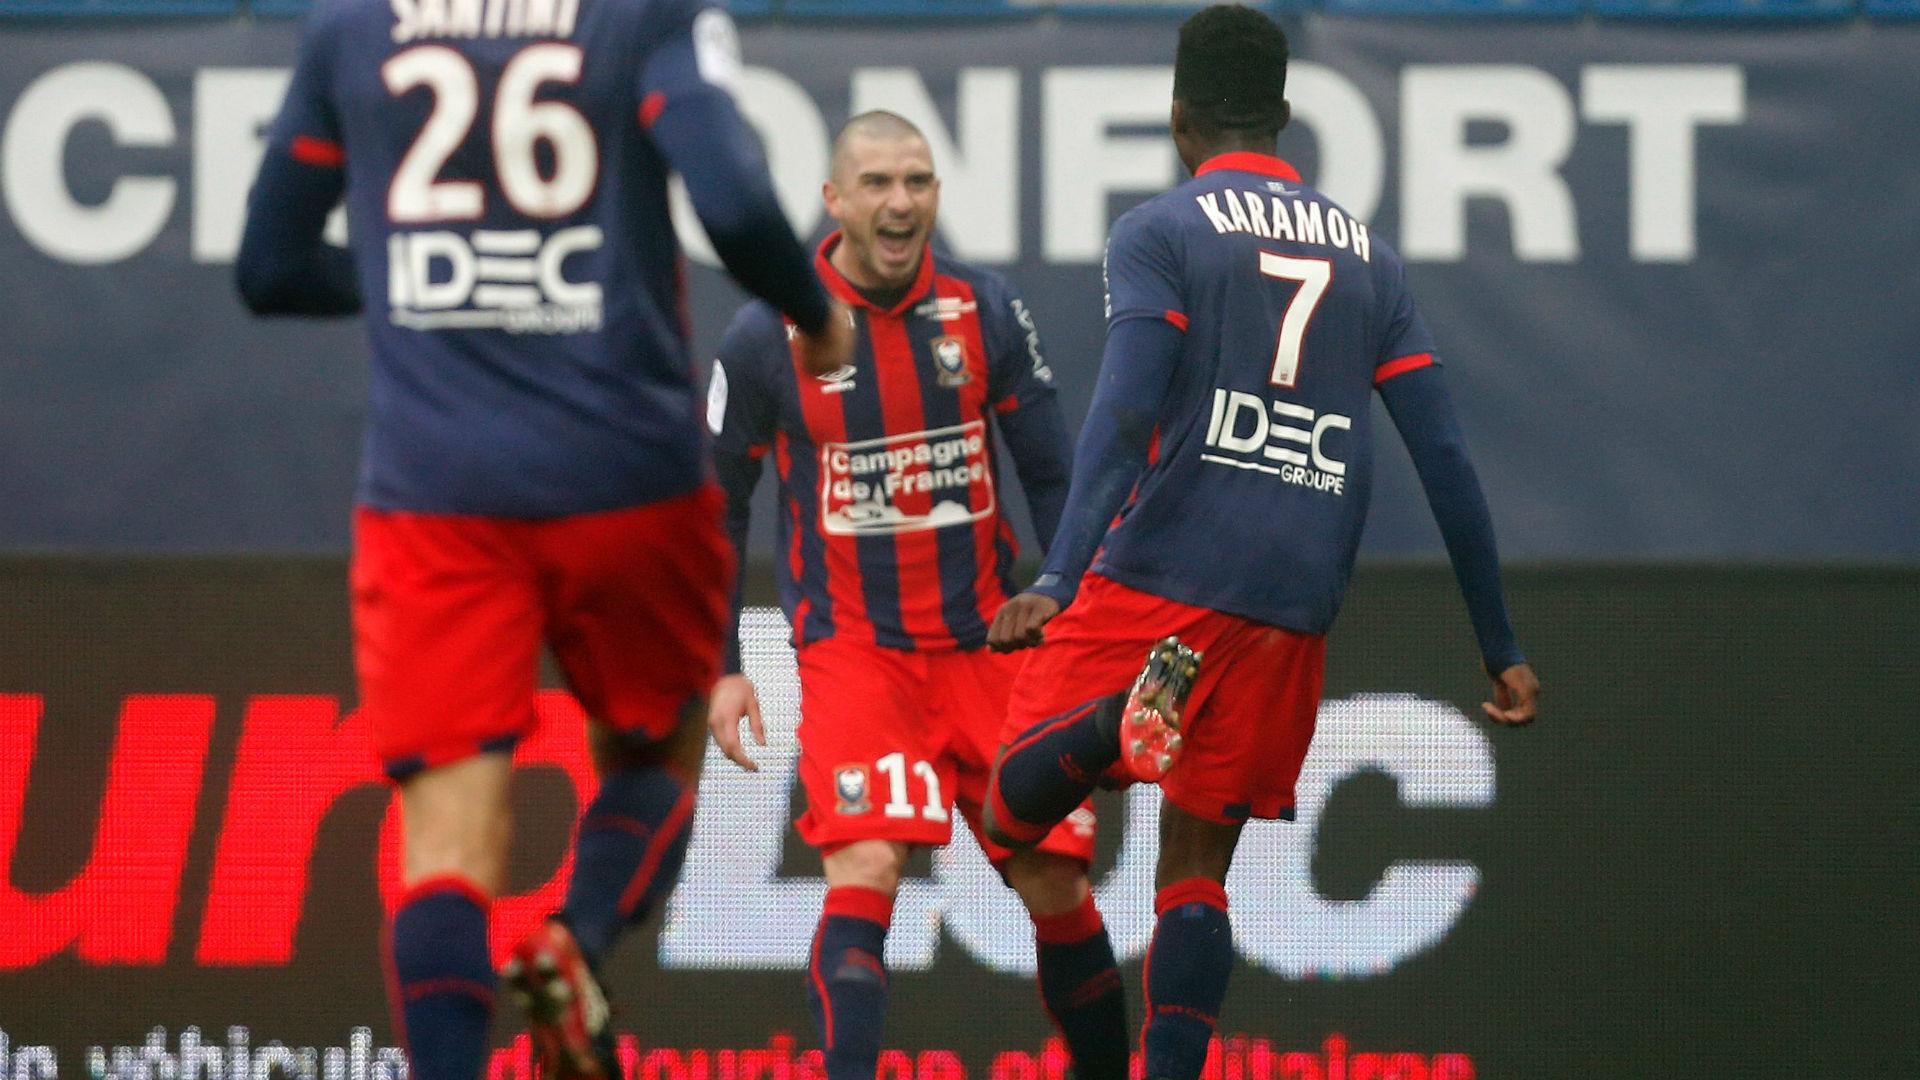 Ligue 1: Caen-Metz reporté à dimanche à cause du brouillard